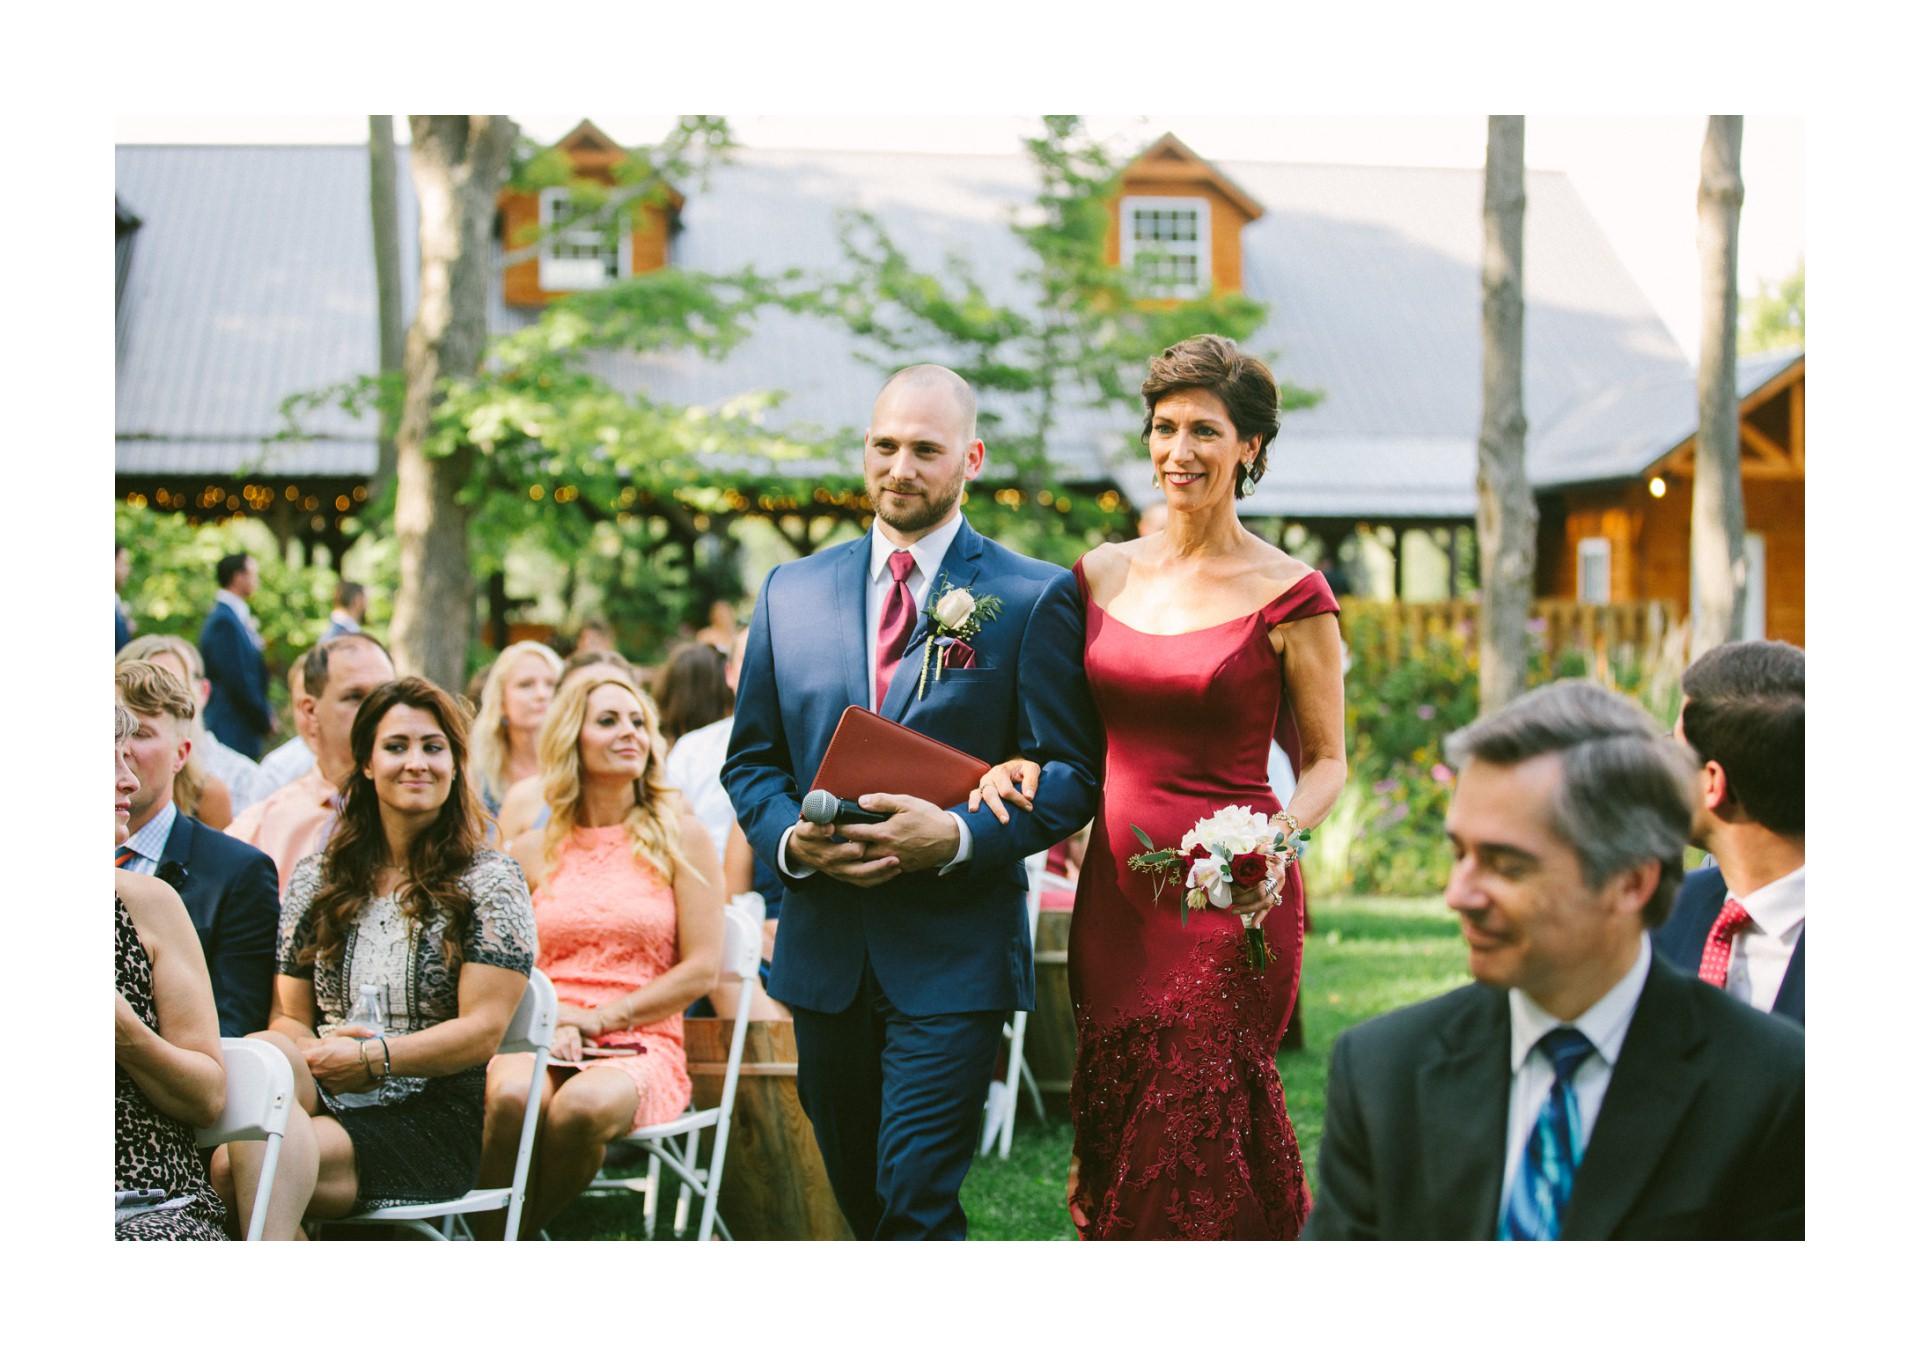 Meadow Ridge Farm Wedding Photos in Windsor 2 15.jpg